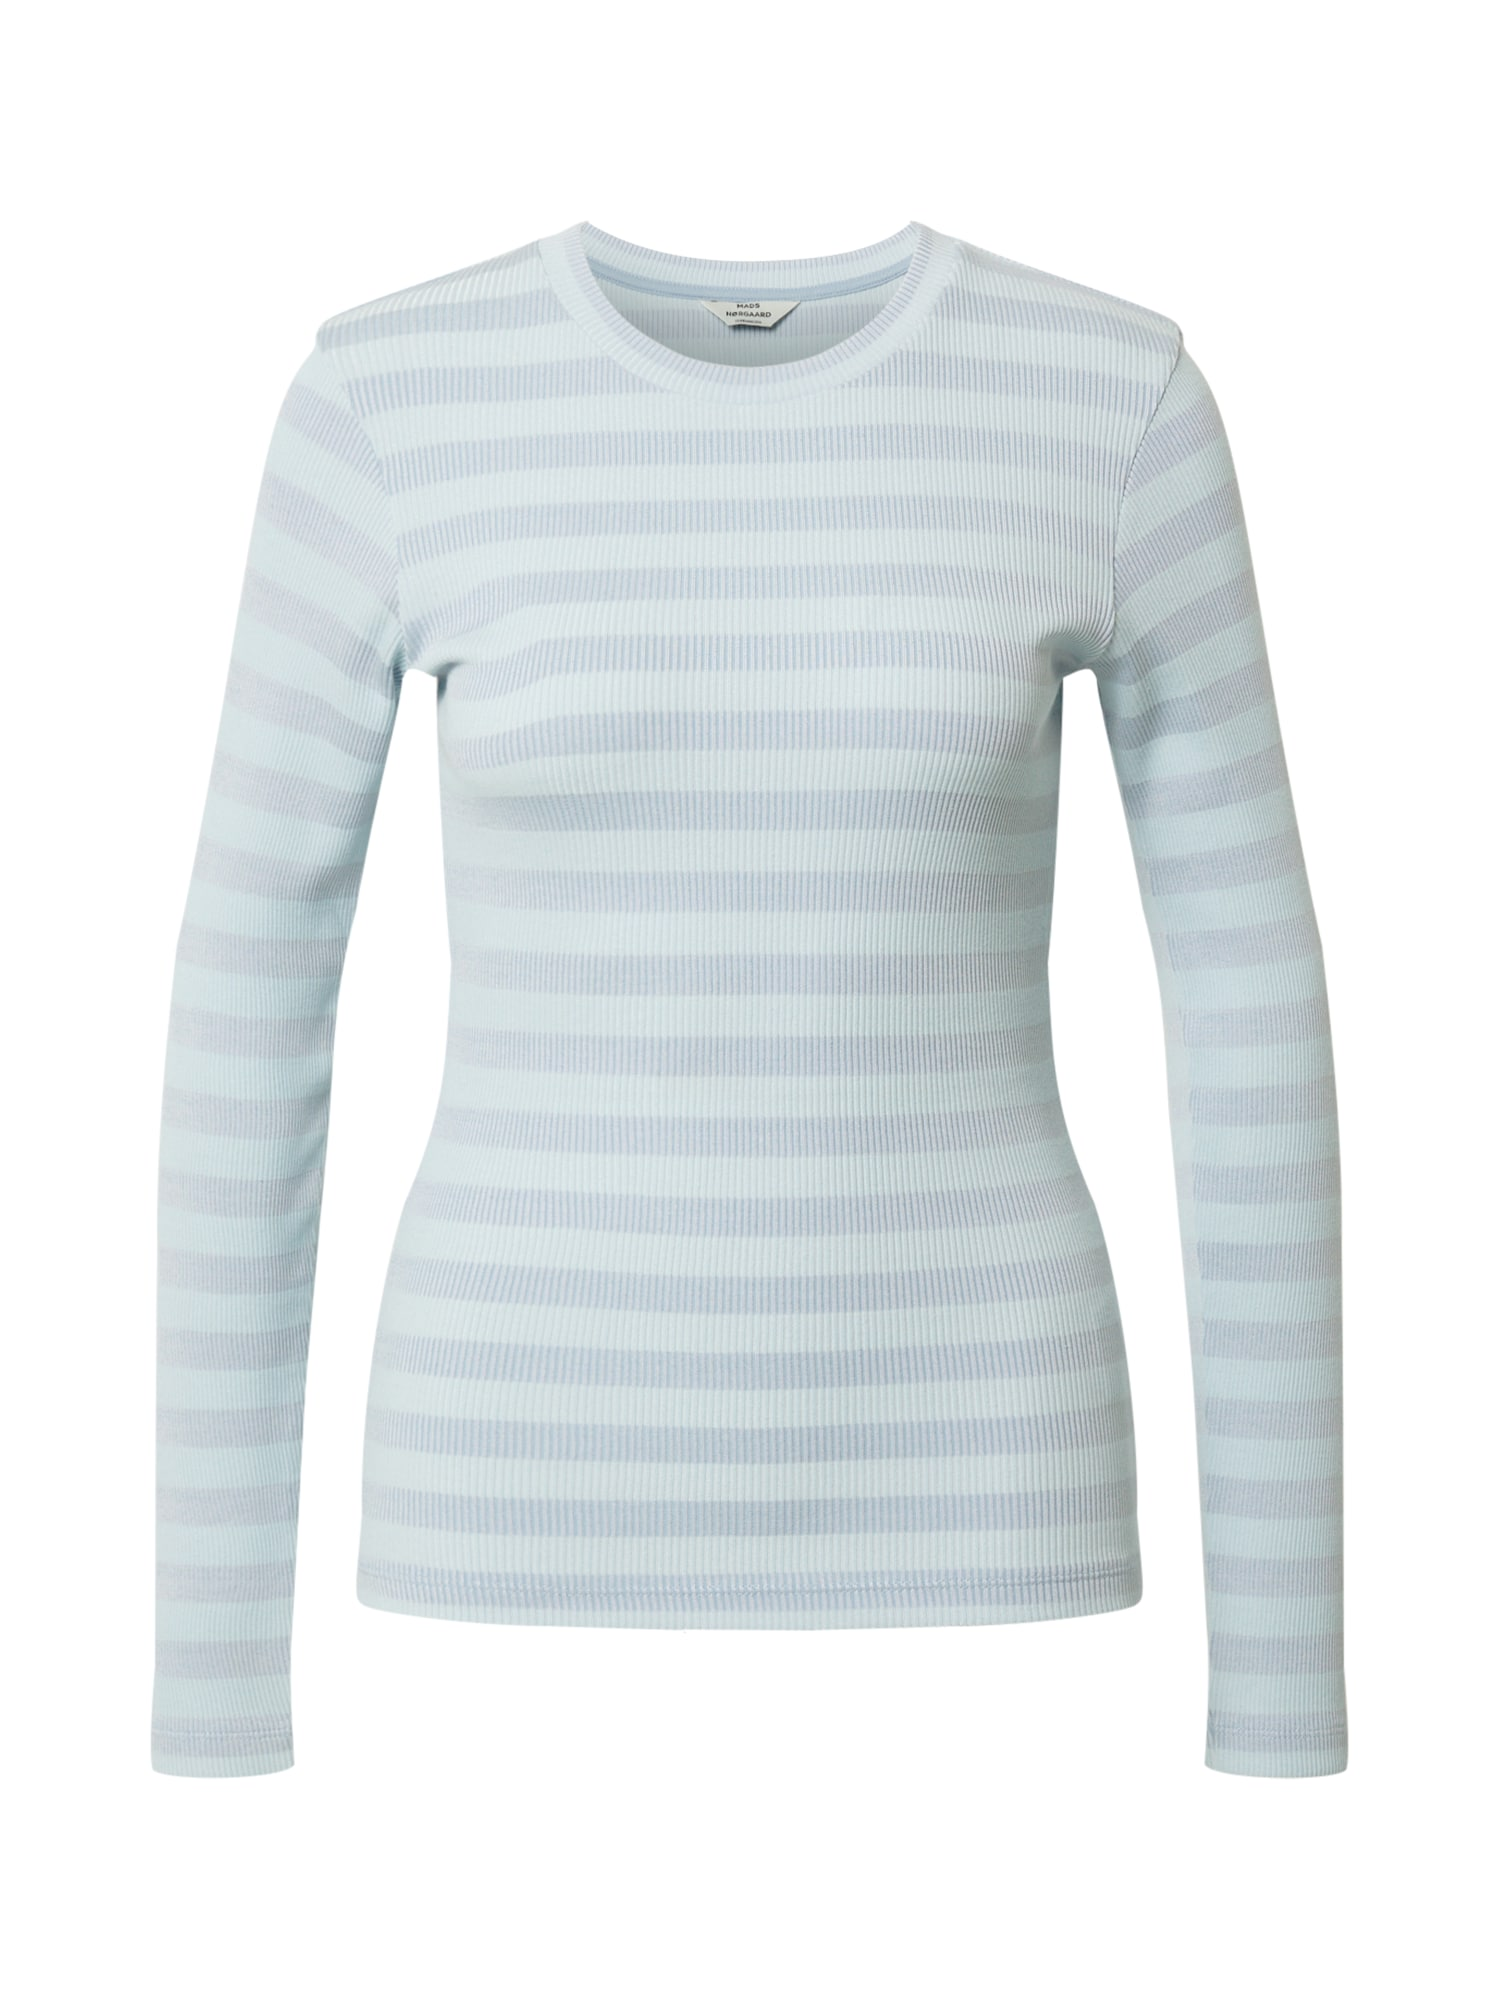 MADS NORGAARD COPENHAGEN Marškinėliai mėlyna dūmų spalva / azuro spalva